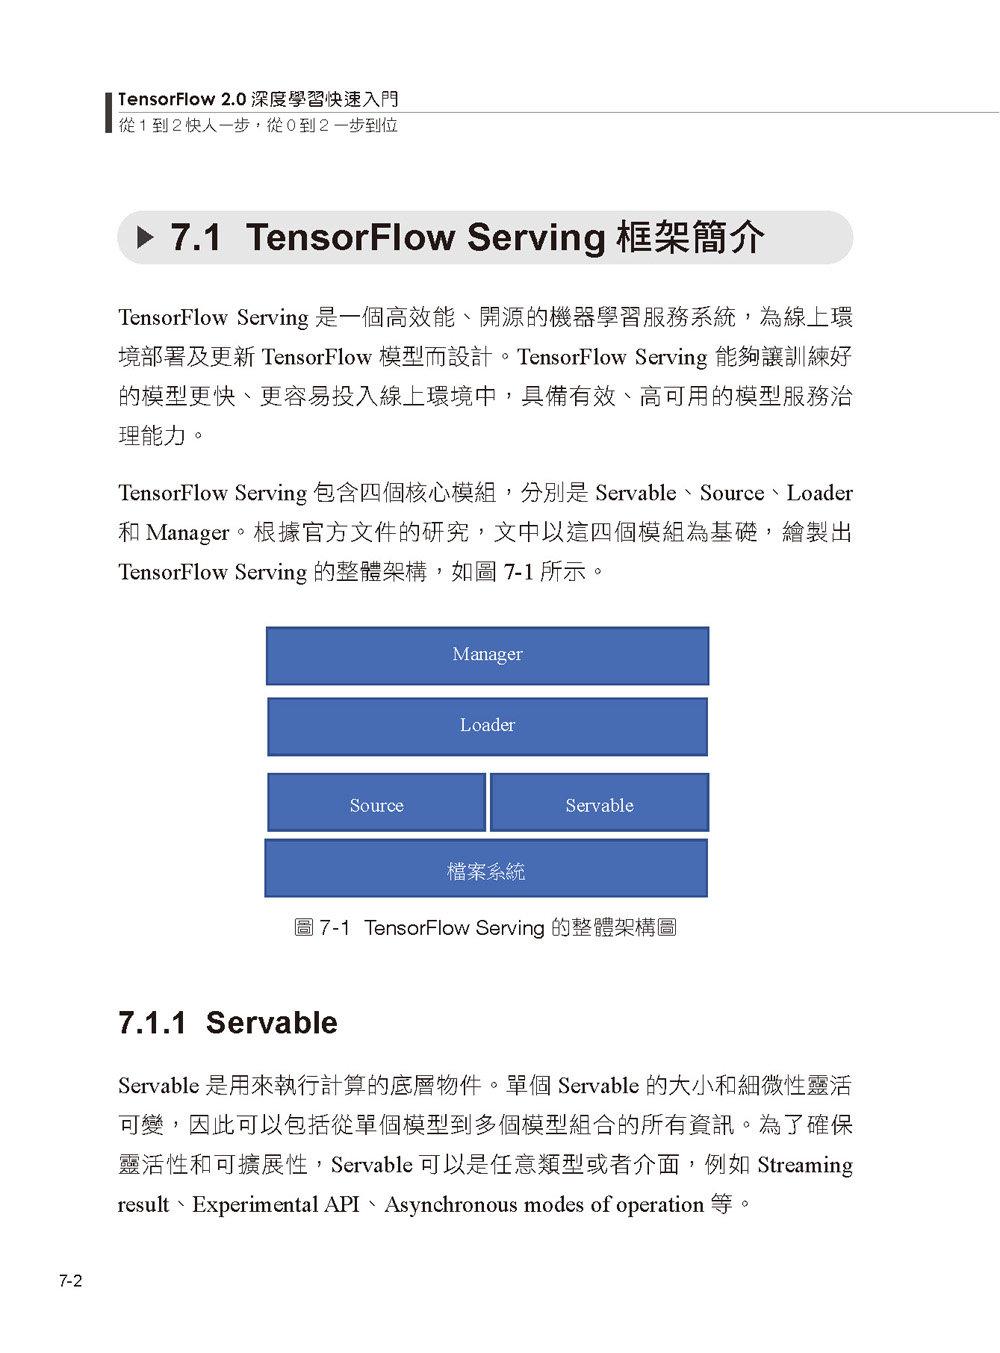 TensorFlow 2.0 深度學習快速入門:從1到2快人一步,從0到2一步到位-preview-11